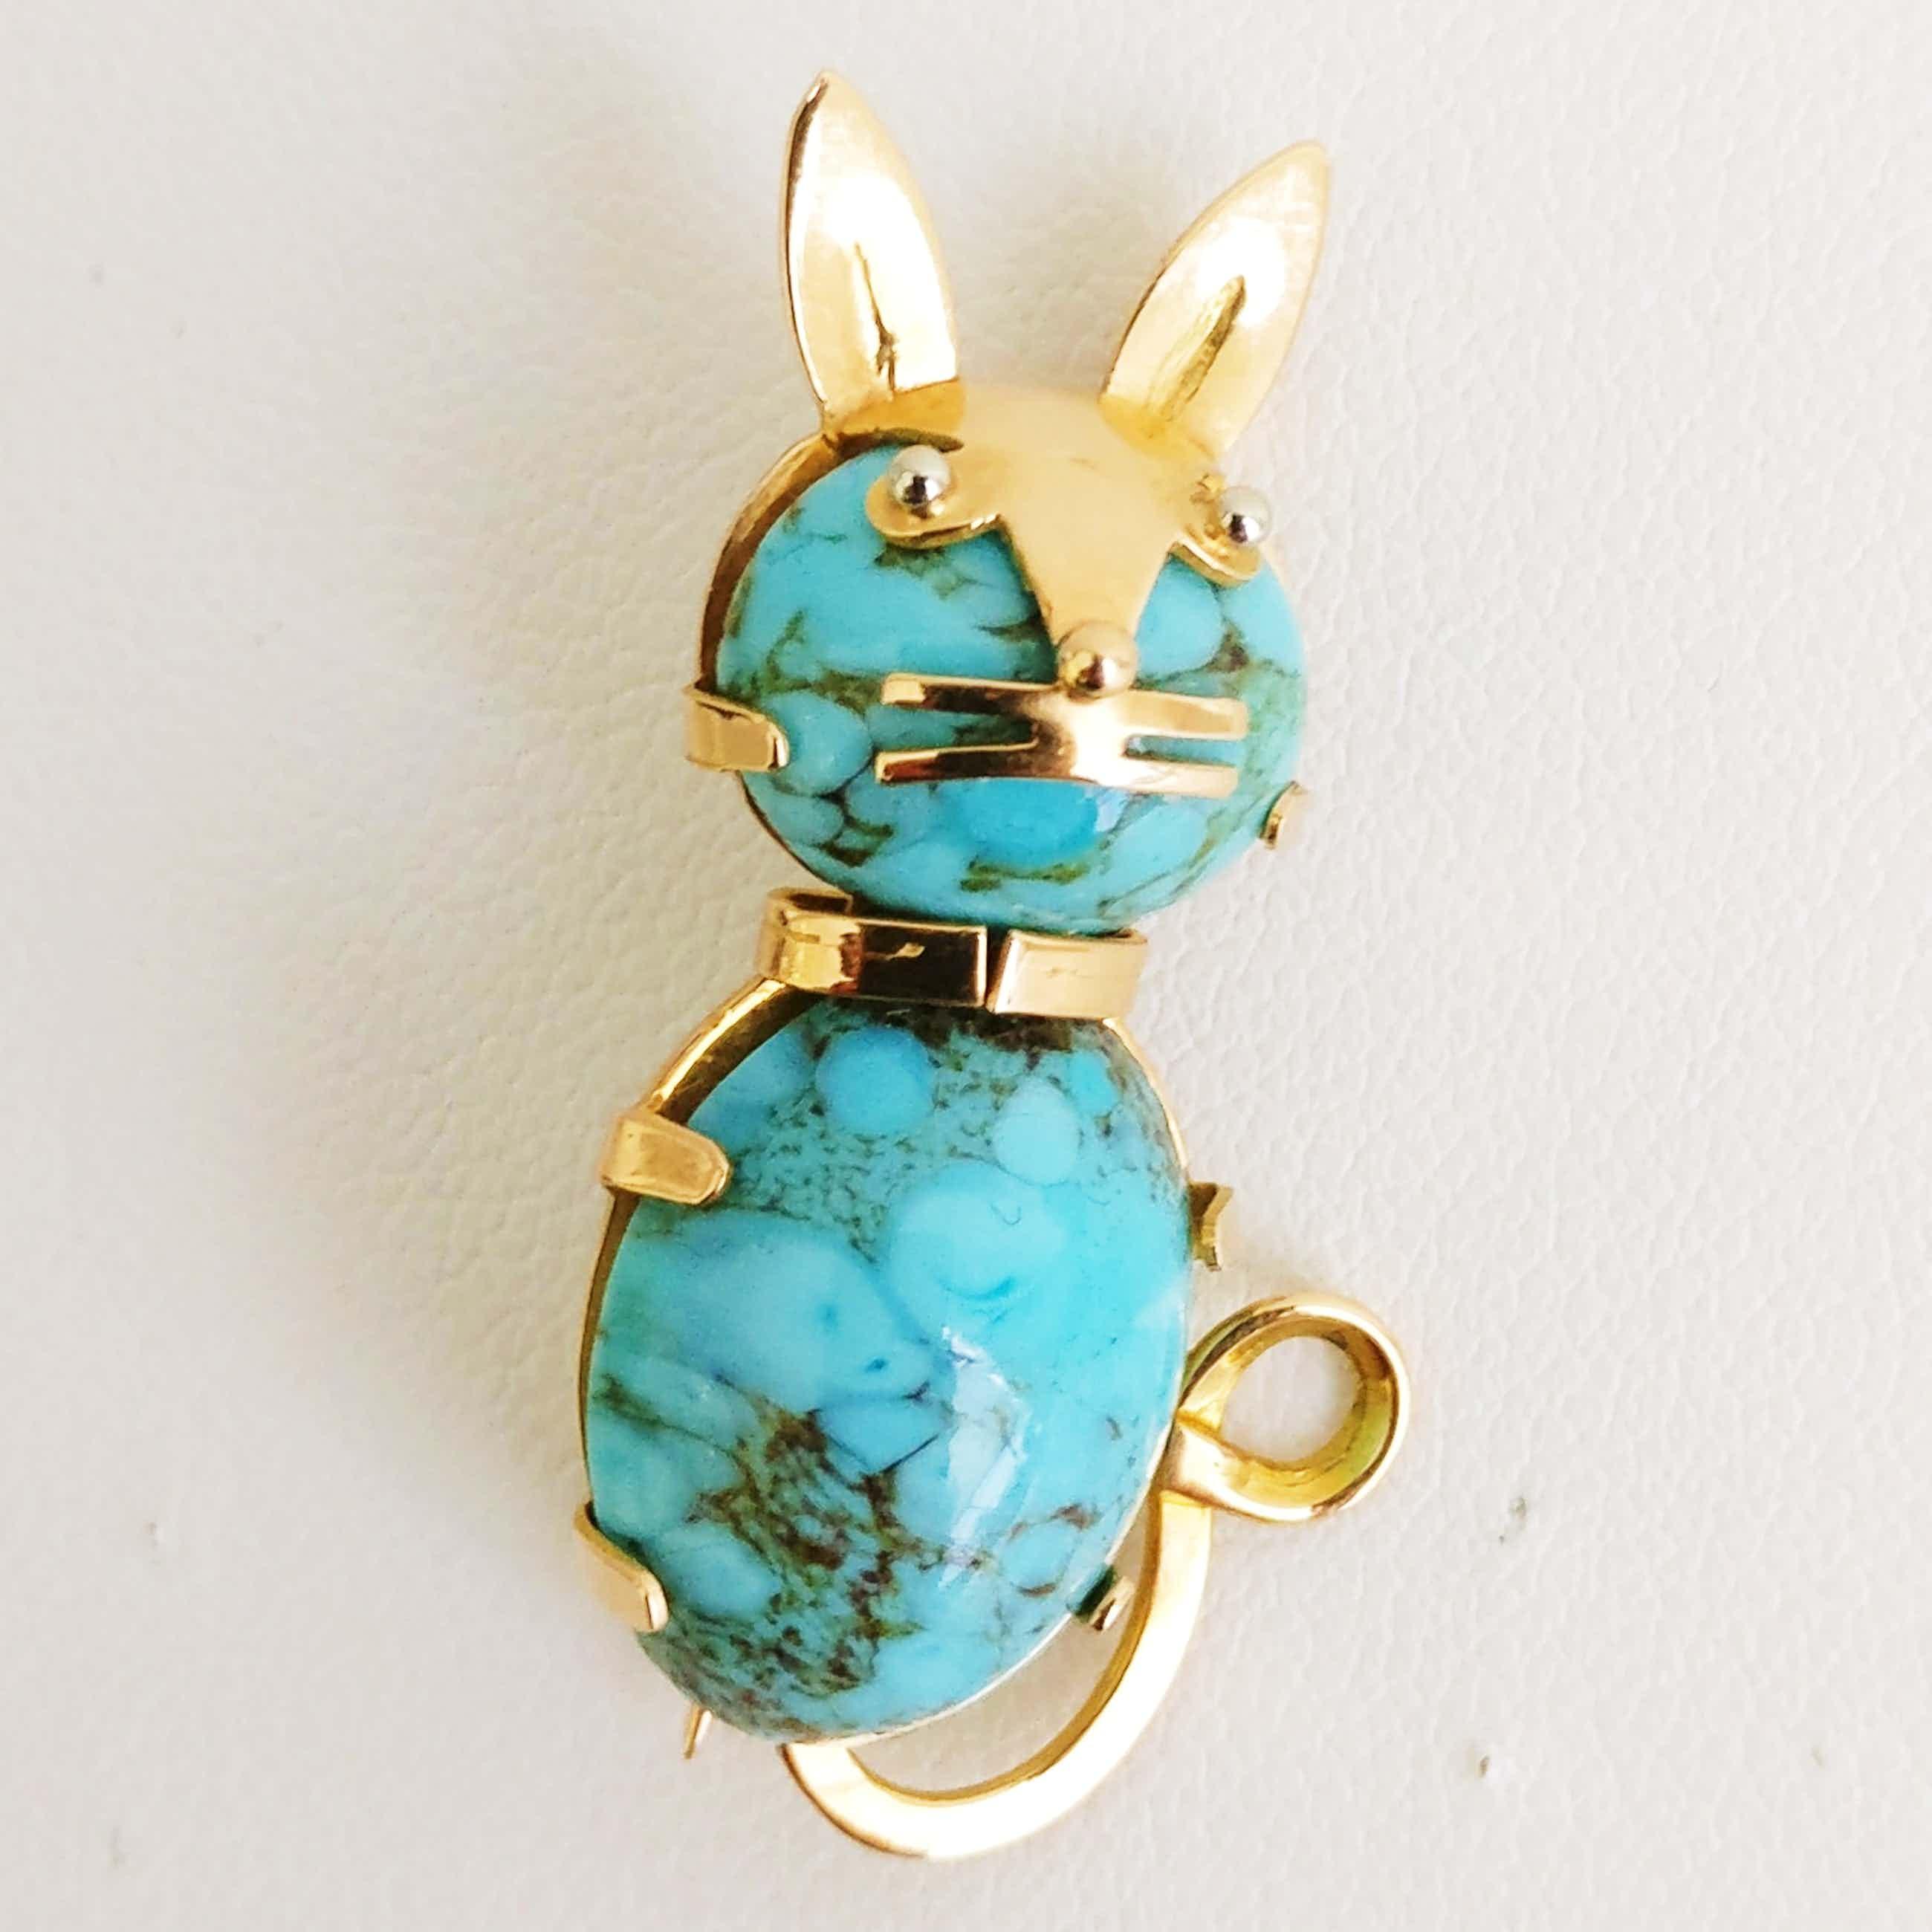 Vintage Cat Brooch in Turquoise and Gold kopen? Bied vanaf 210!